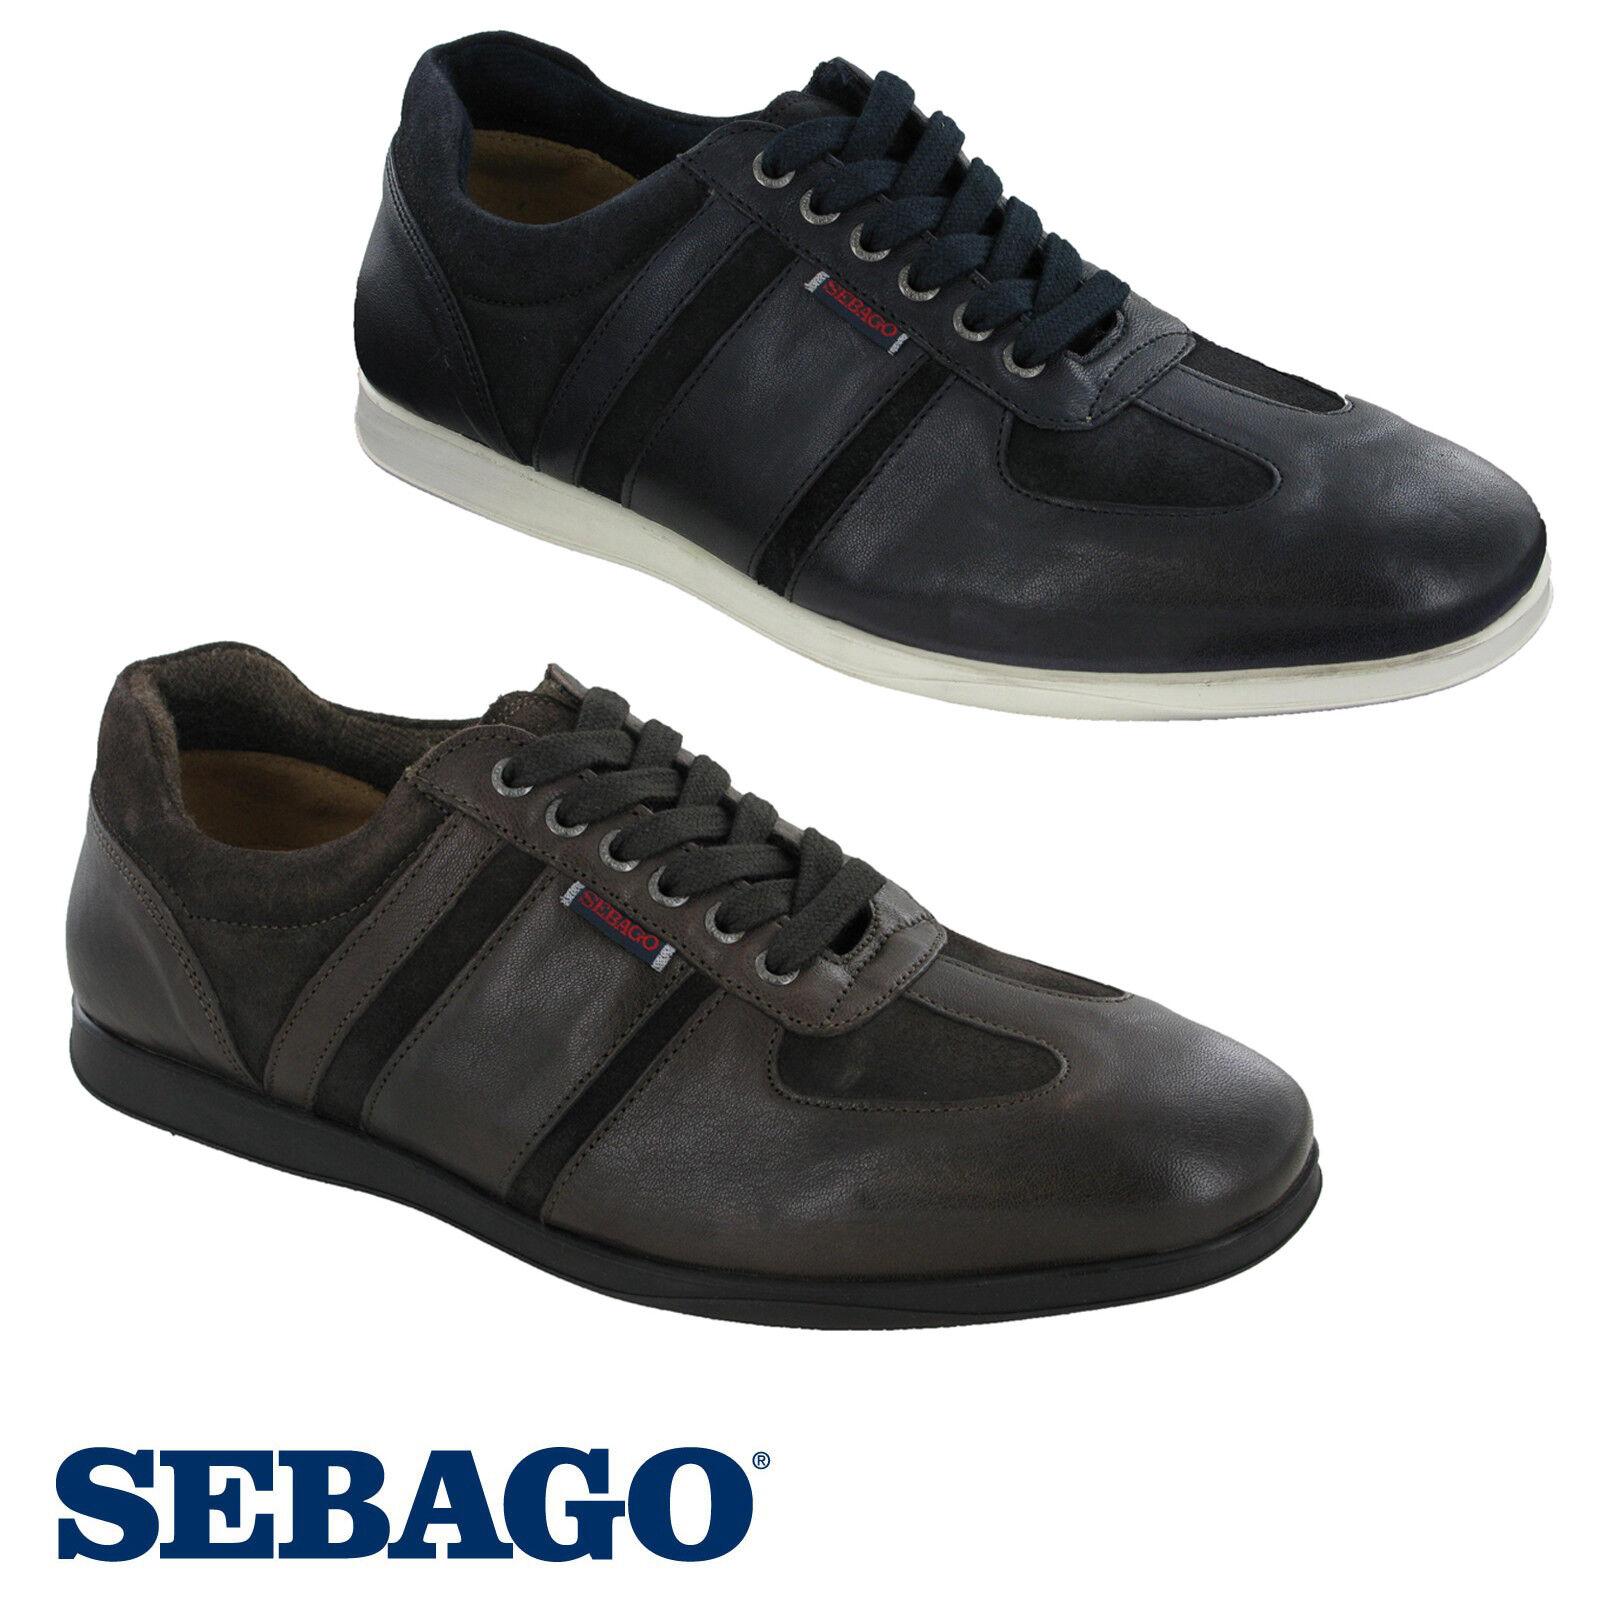 Sebago Reid Lace Up Mens Trainers Leather Low Cut Smart Casual shoes UK8-10.5